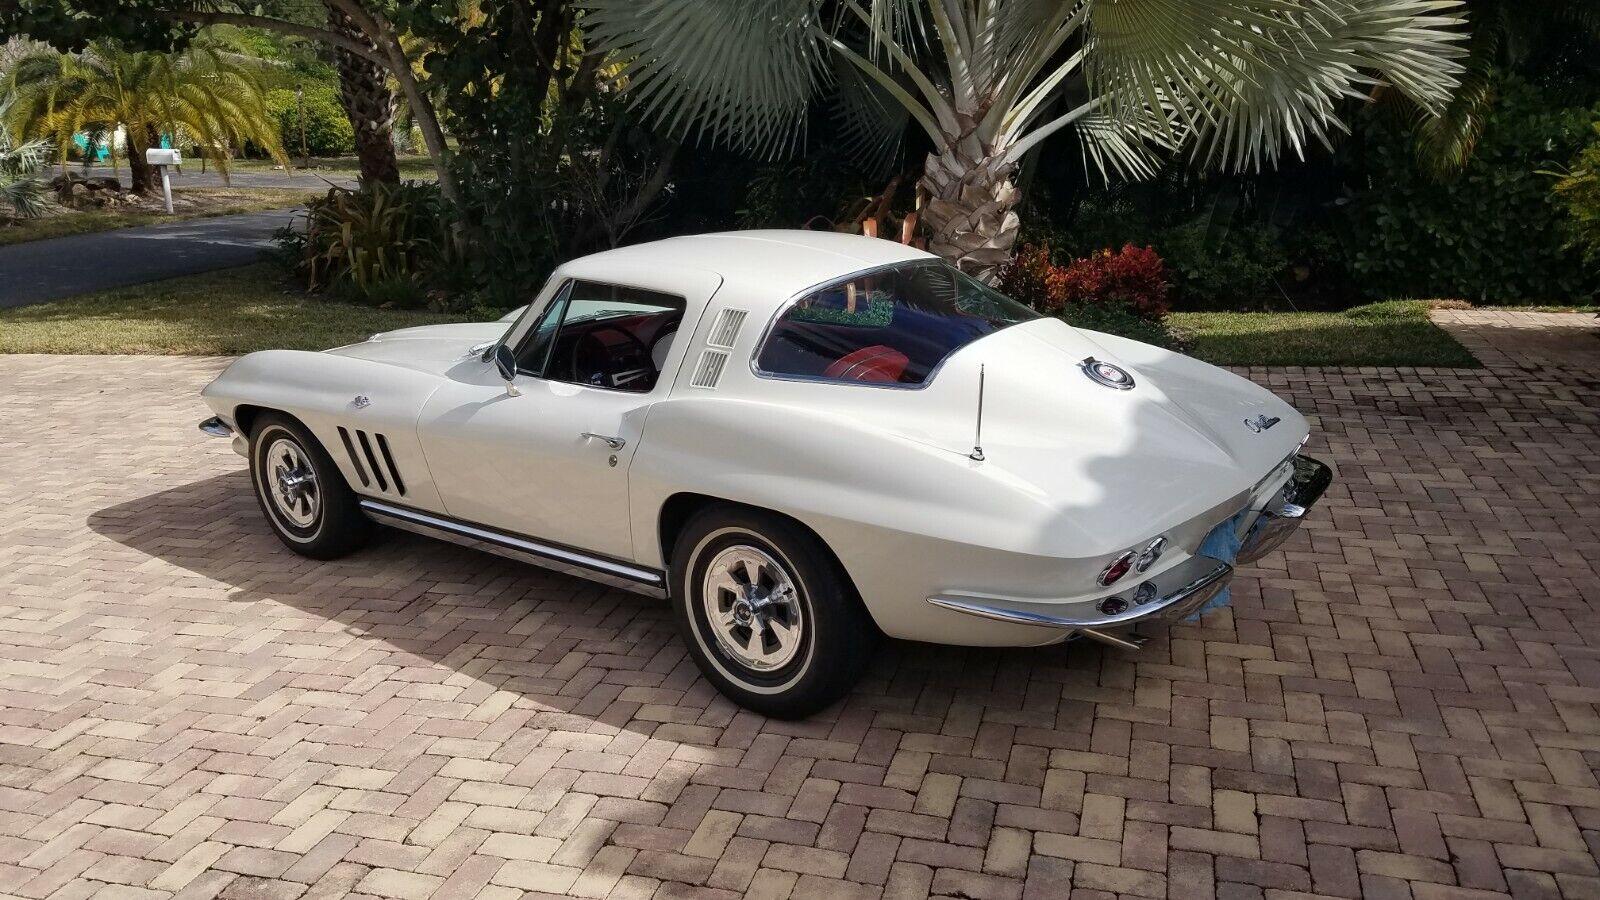 1965  Chevrolet Corvette     C2 Corvette Photo 1